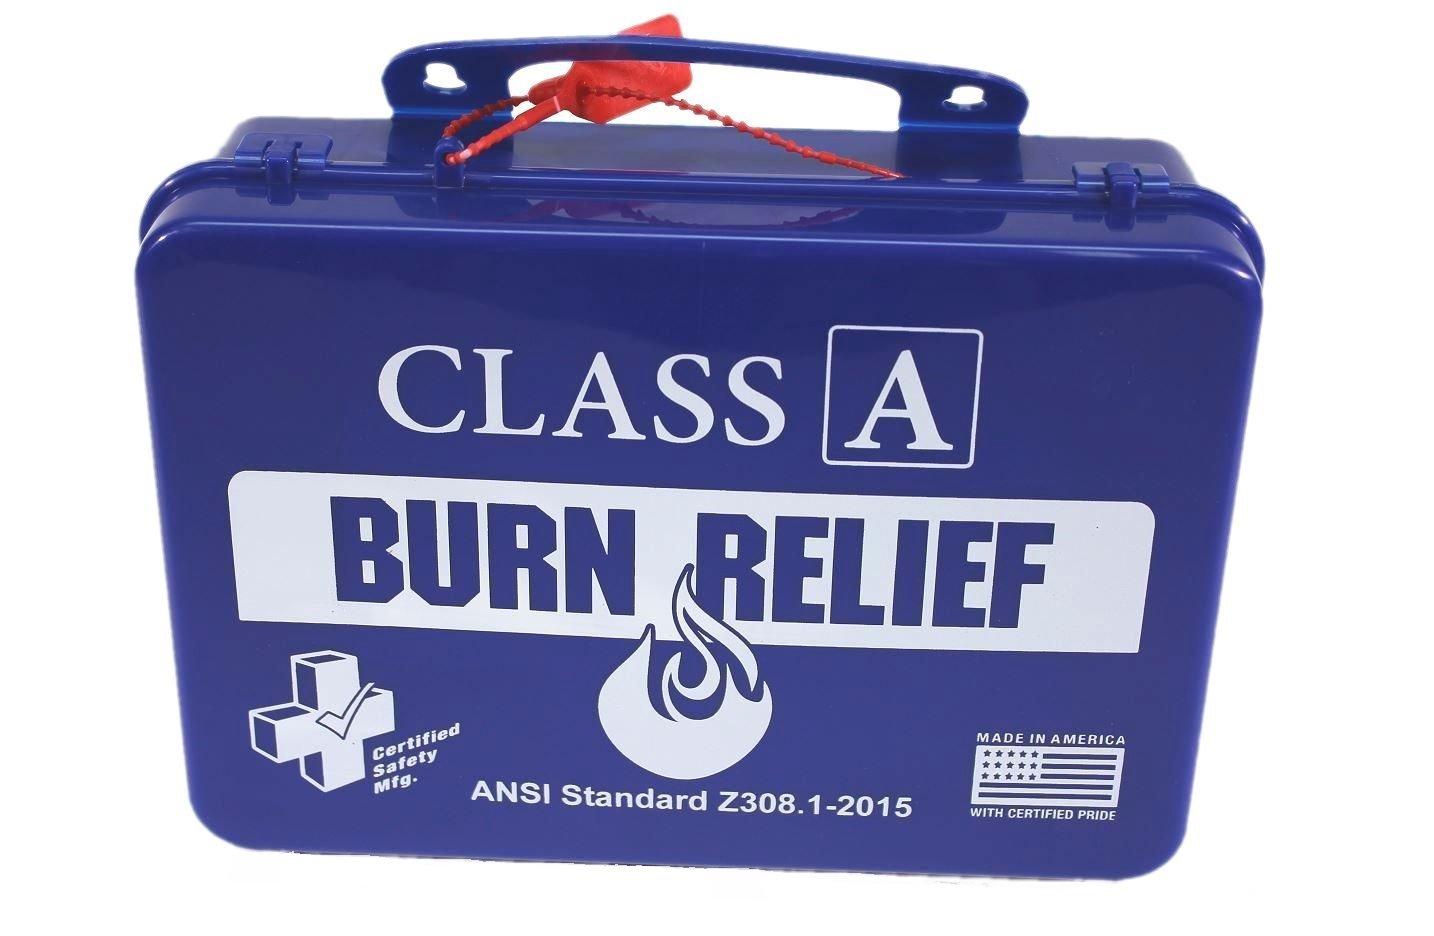 Certified Safety K616-017 18PB Class A First Aid Burn Kit, ANSI Z308.1-2015, Plastic Case, Blue